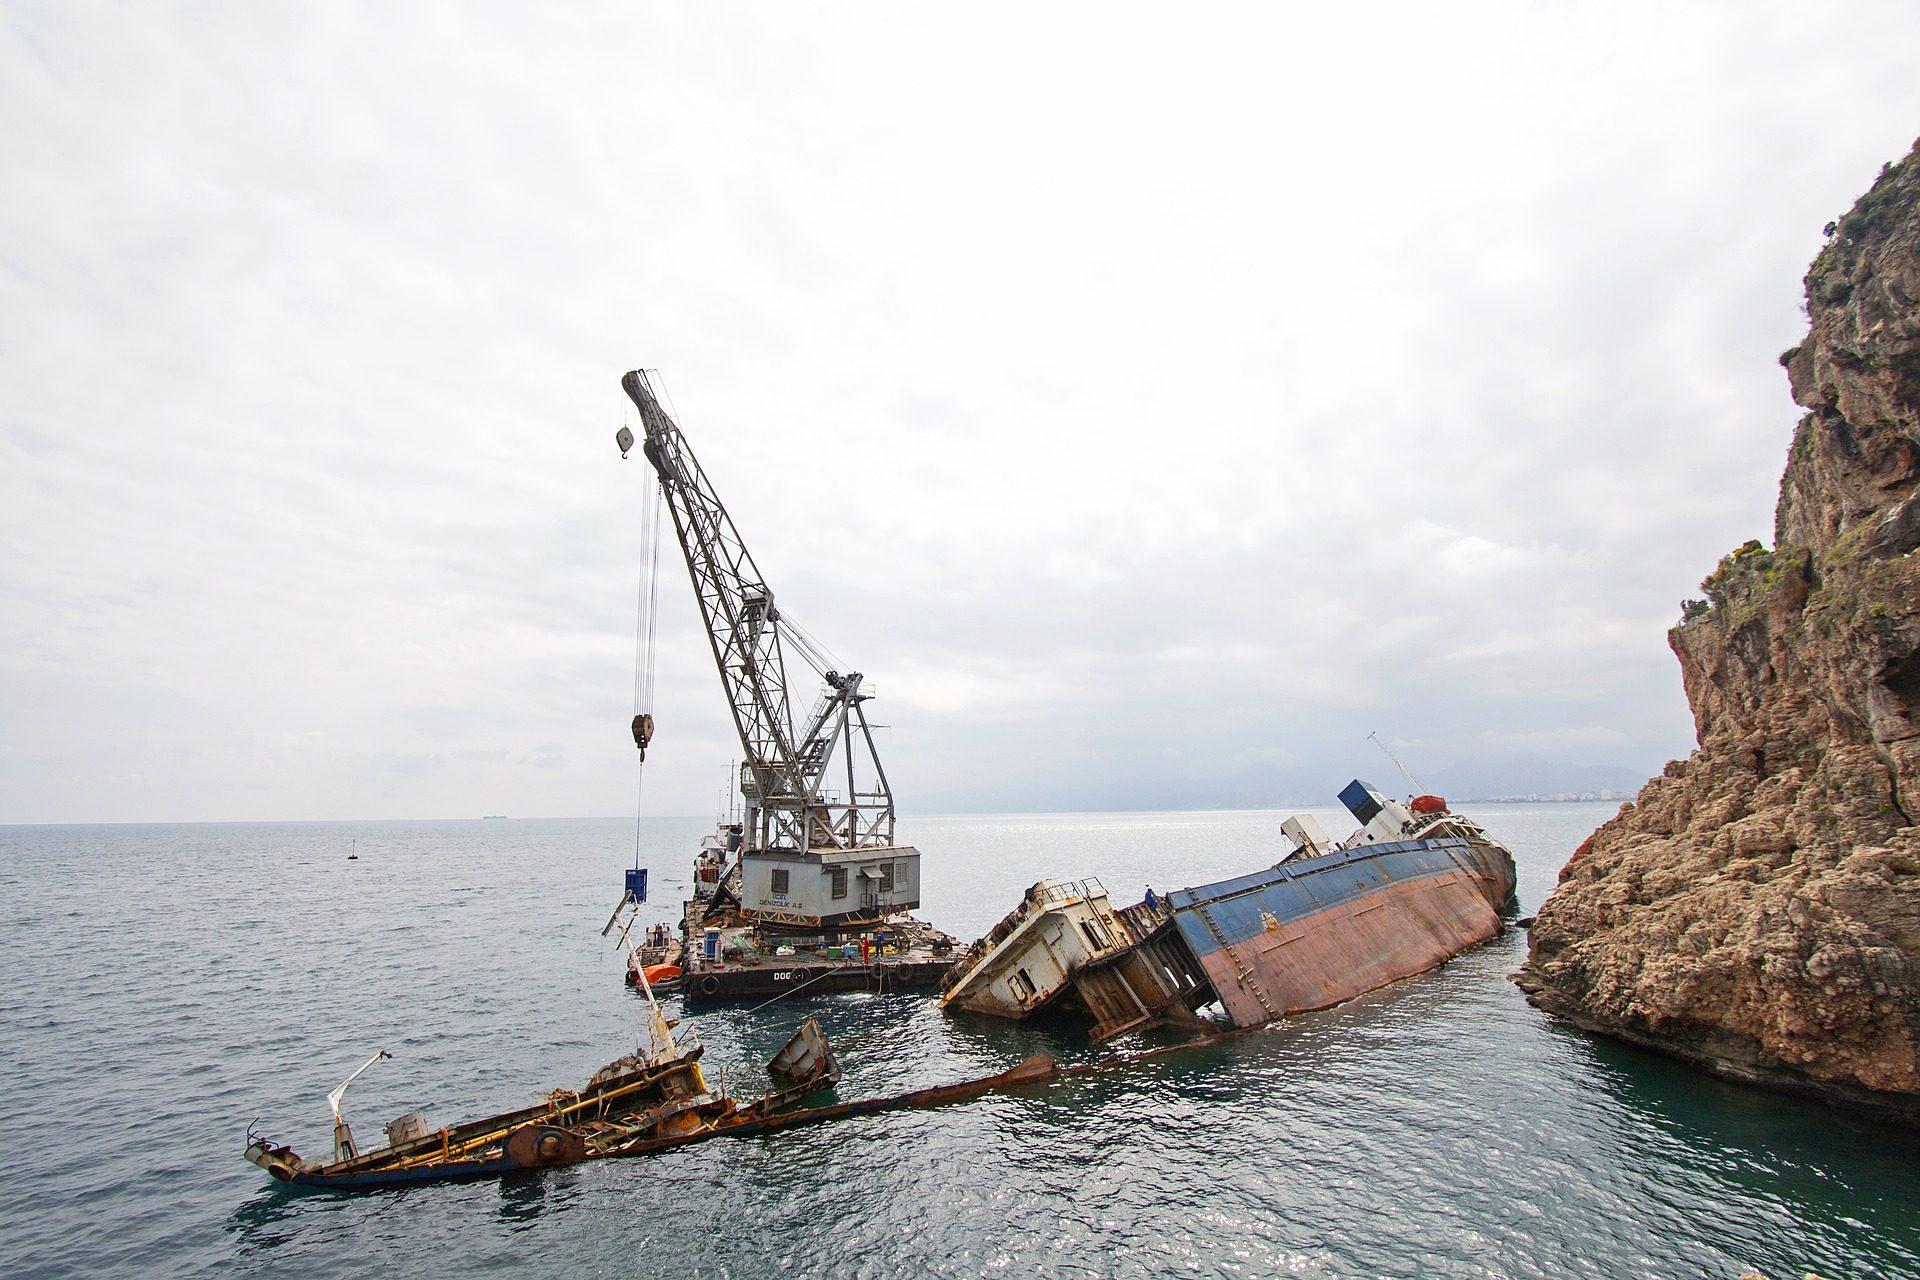 नाव, जहाज, दुर्घटना, डूबने, क्रेन, आपदा - HD वॉलपेपर - प्रोफेसर-falken.com